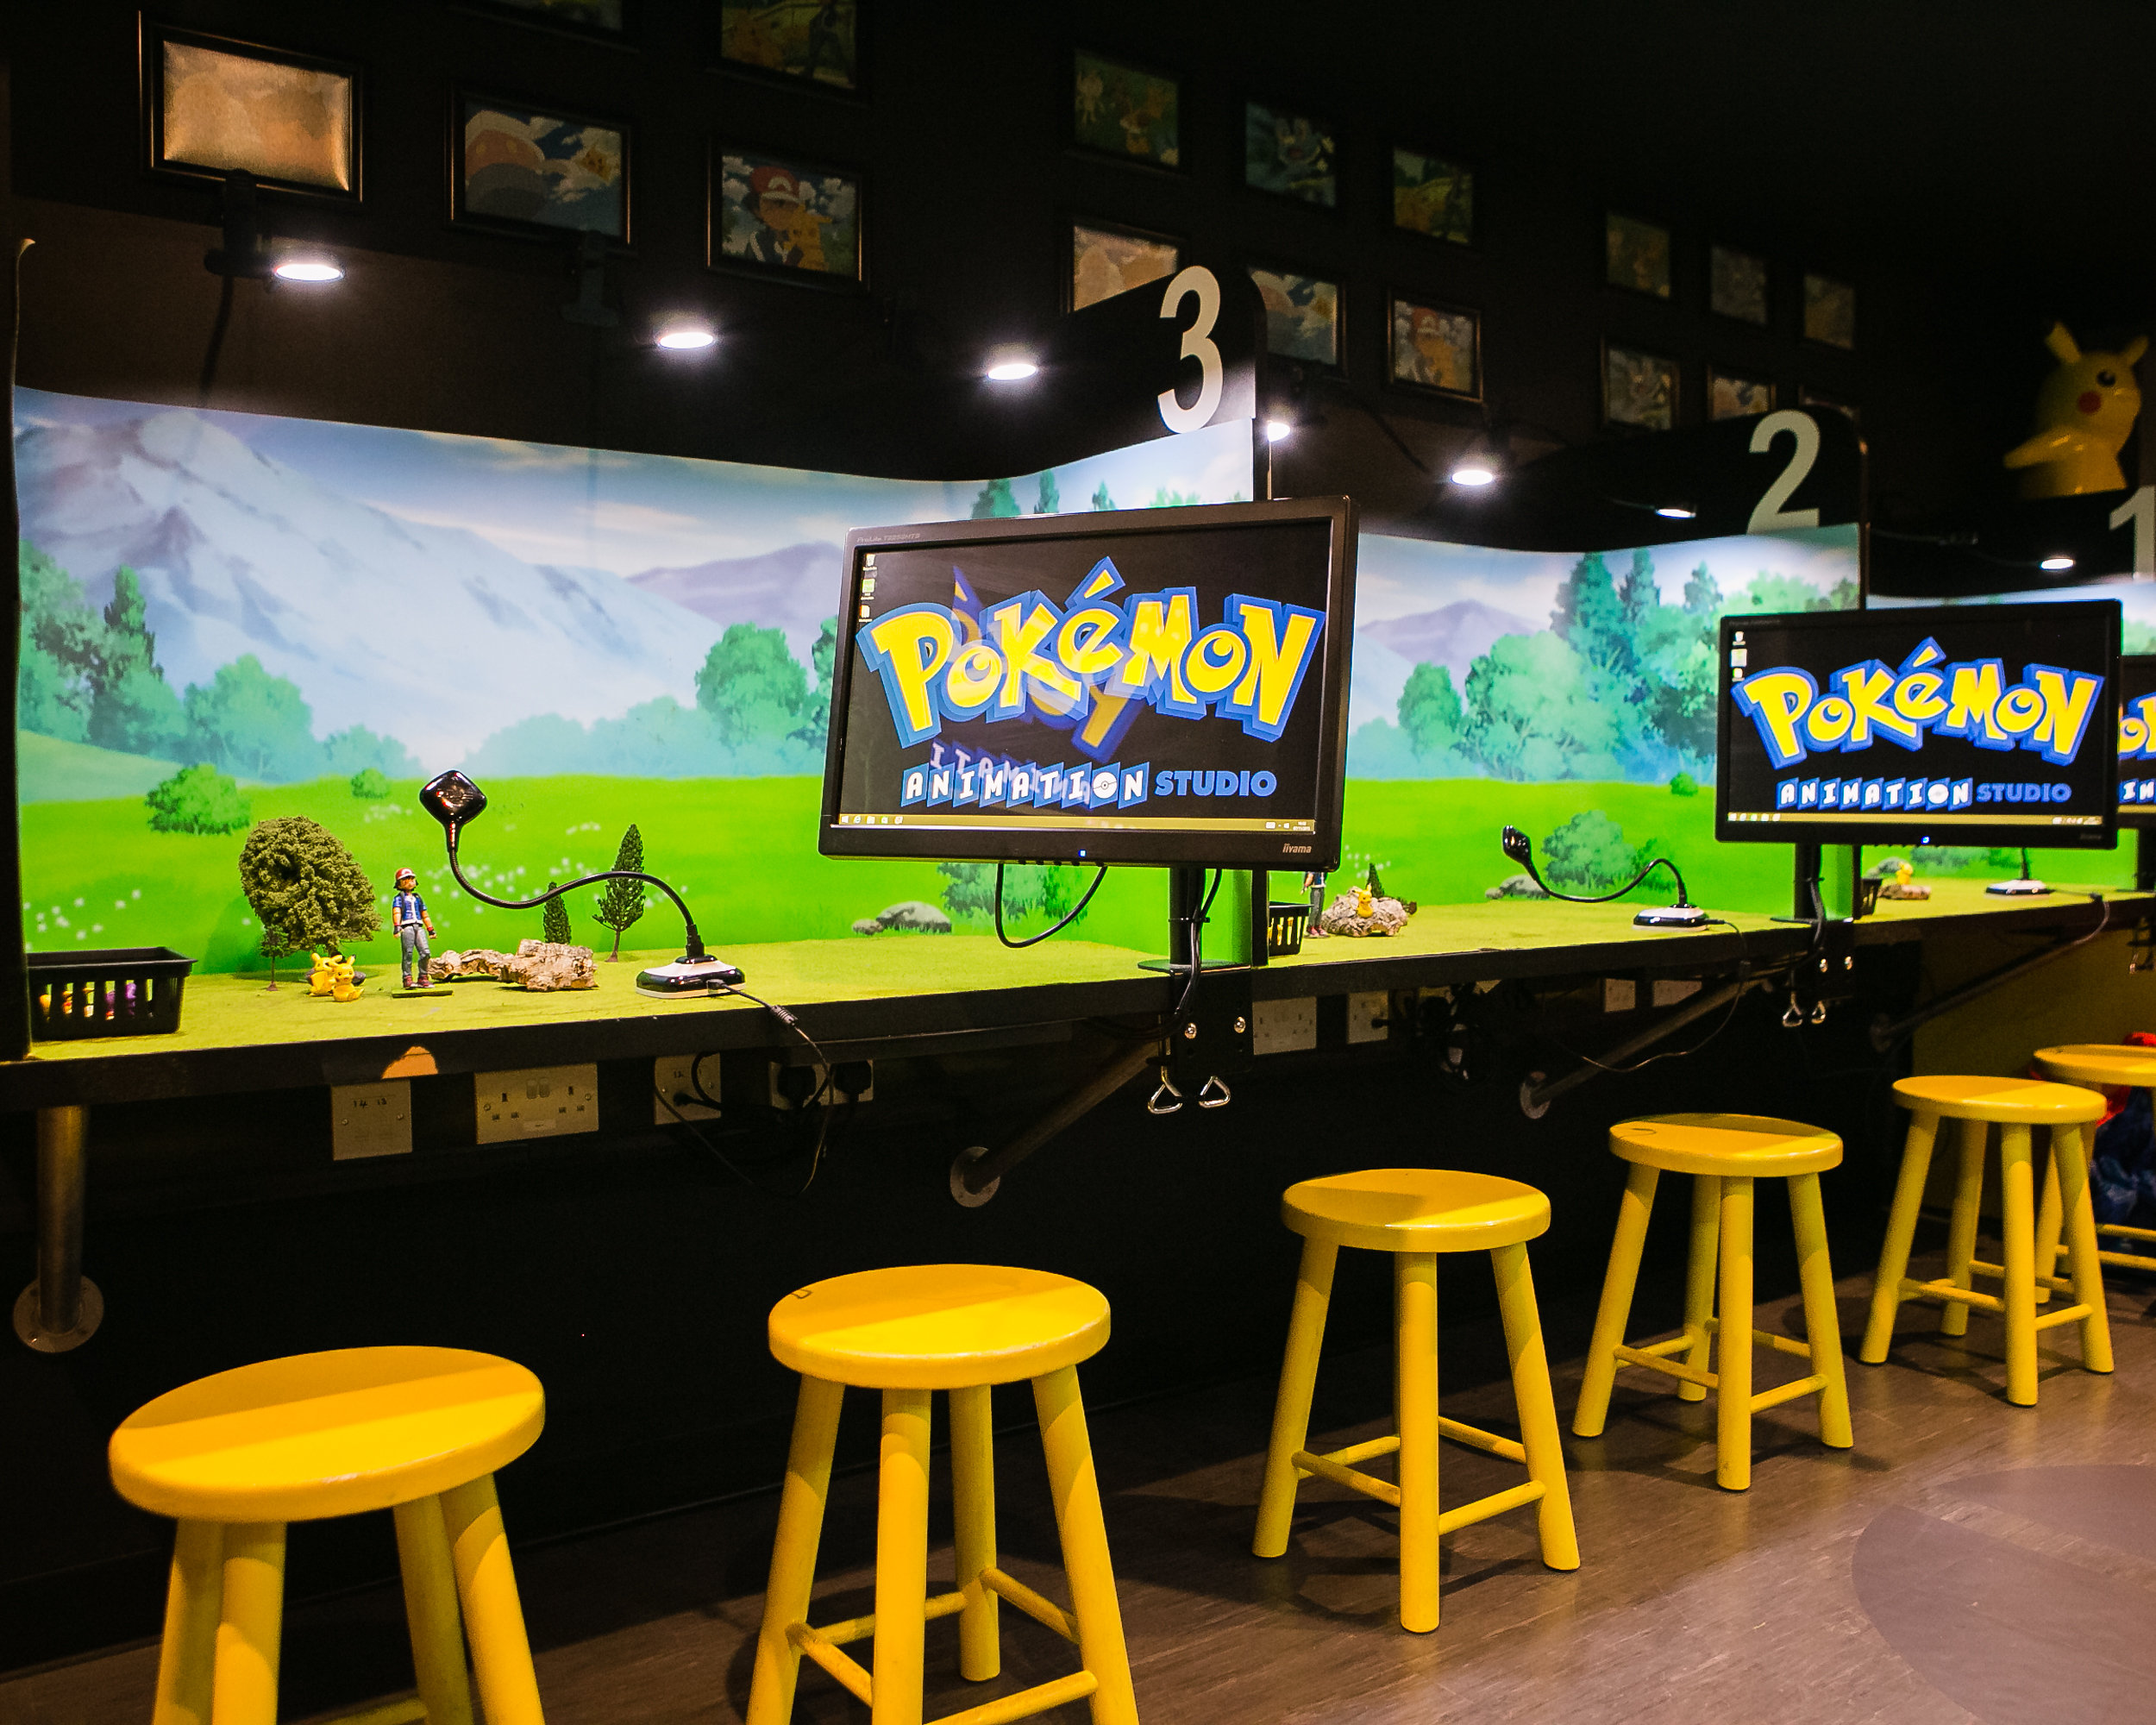 New Pokemon Animation Studio at KidZania London